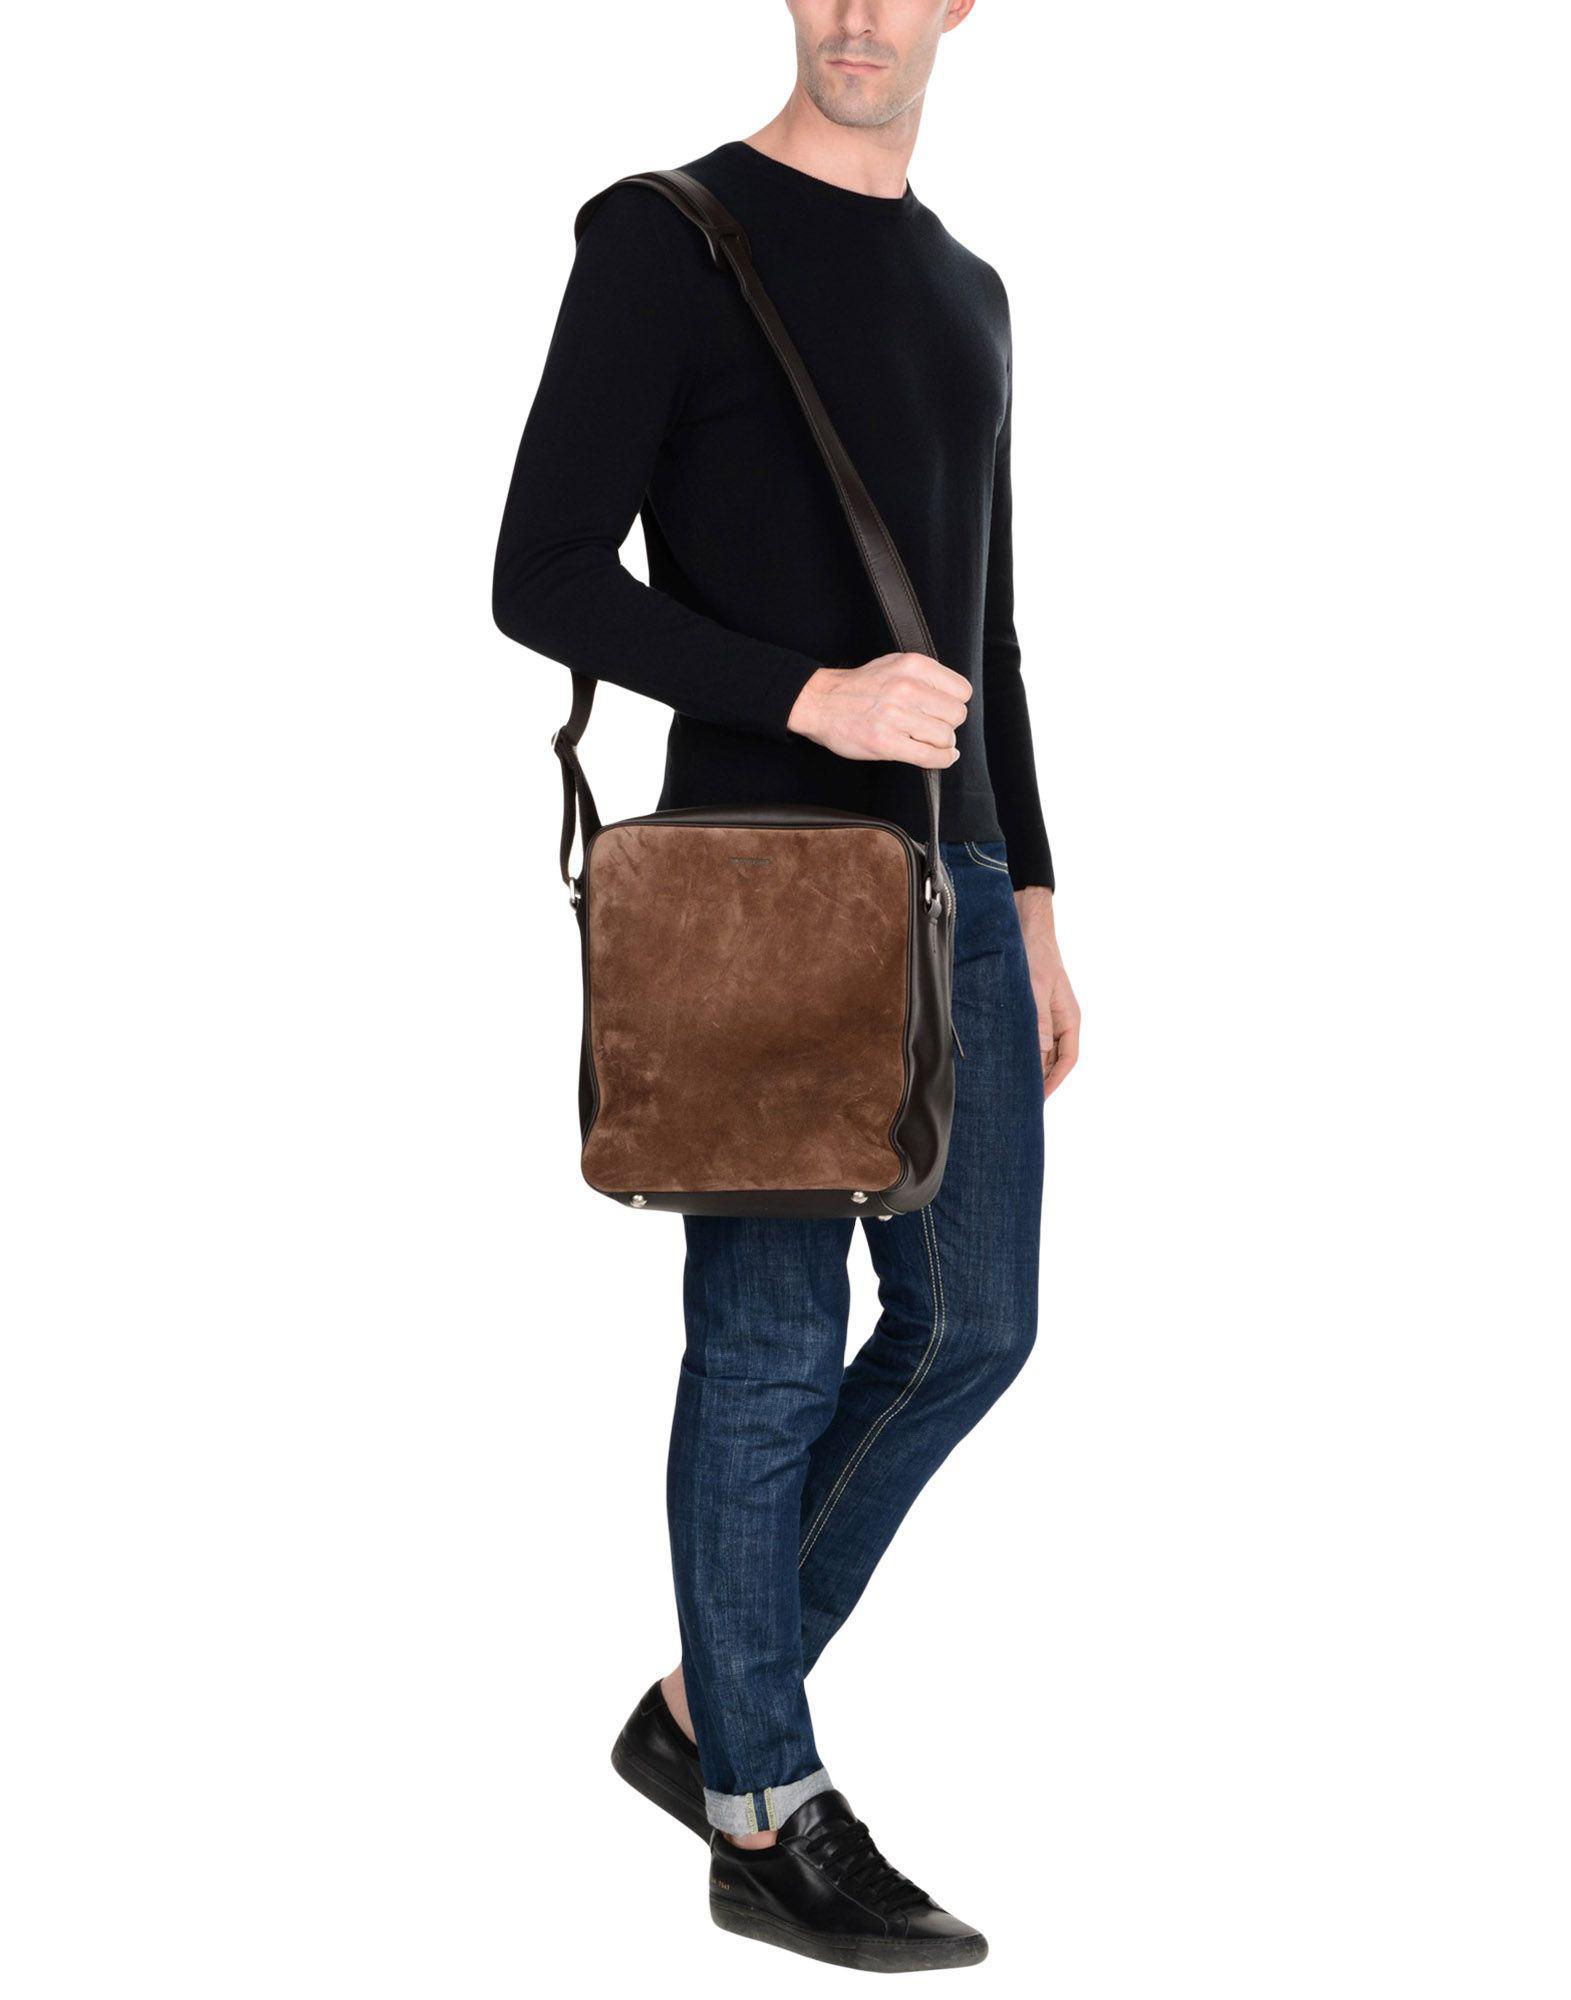 Tom Ford Suede Cross-body Bag in Dark Brown (Brown) for Men